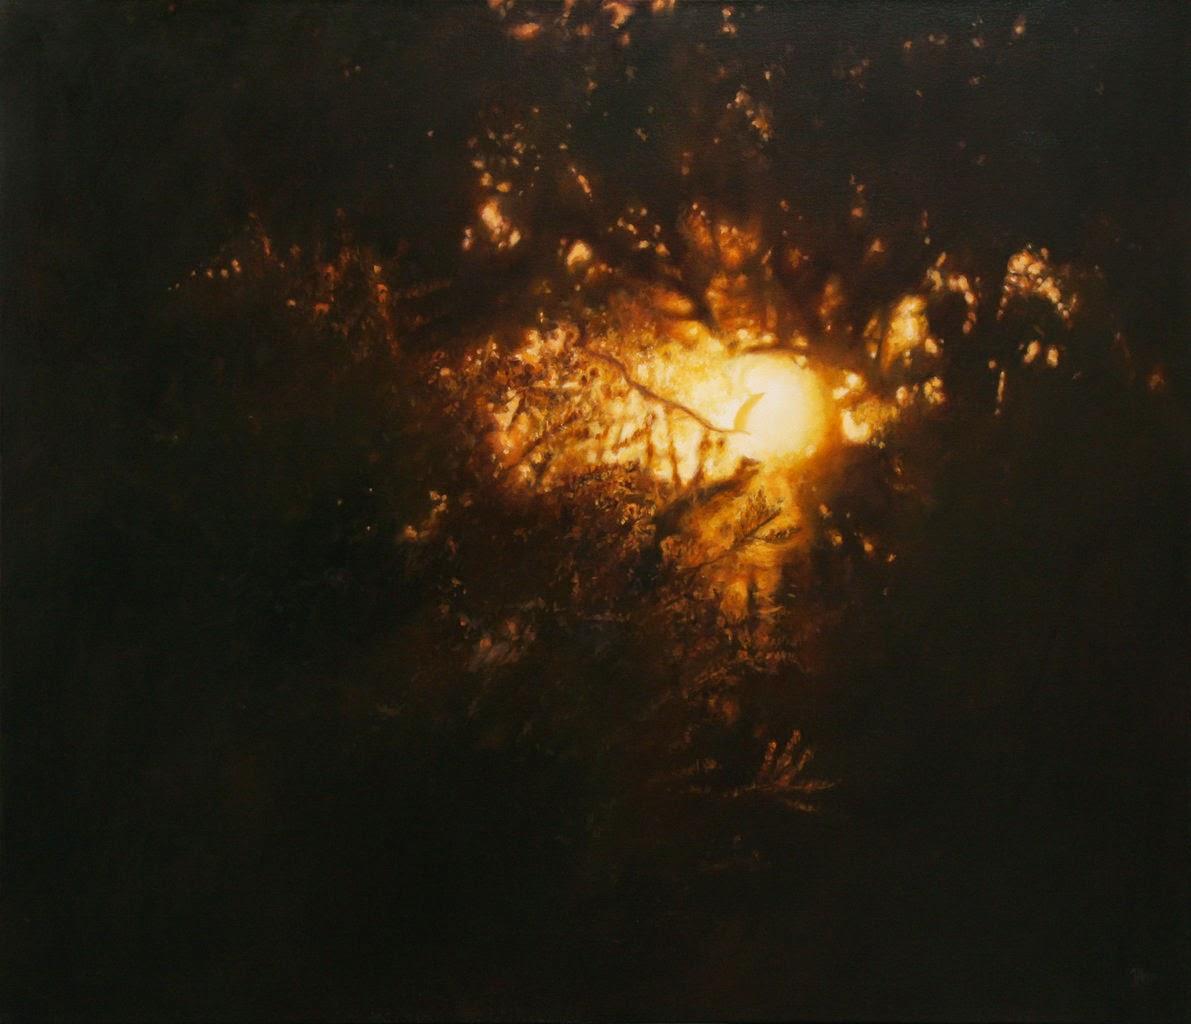 Efêmero - Matthew Weathers e suas pinturas | O pintor da luz